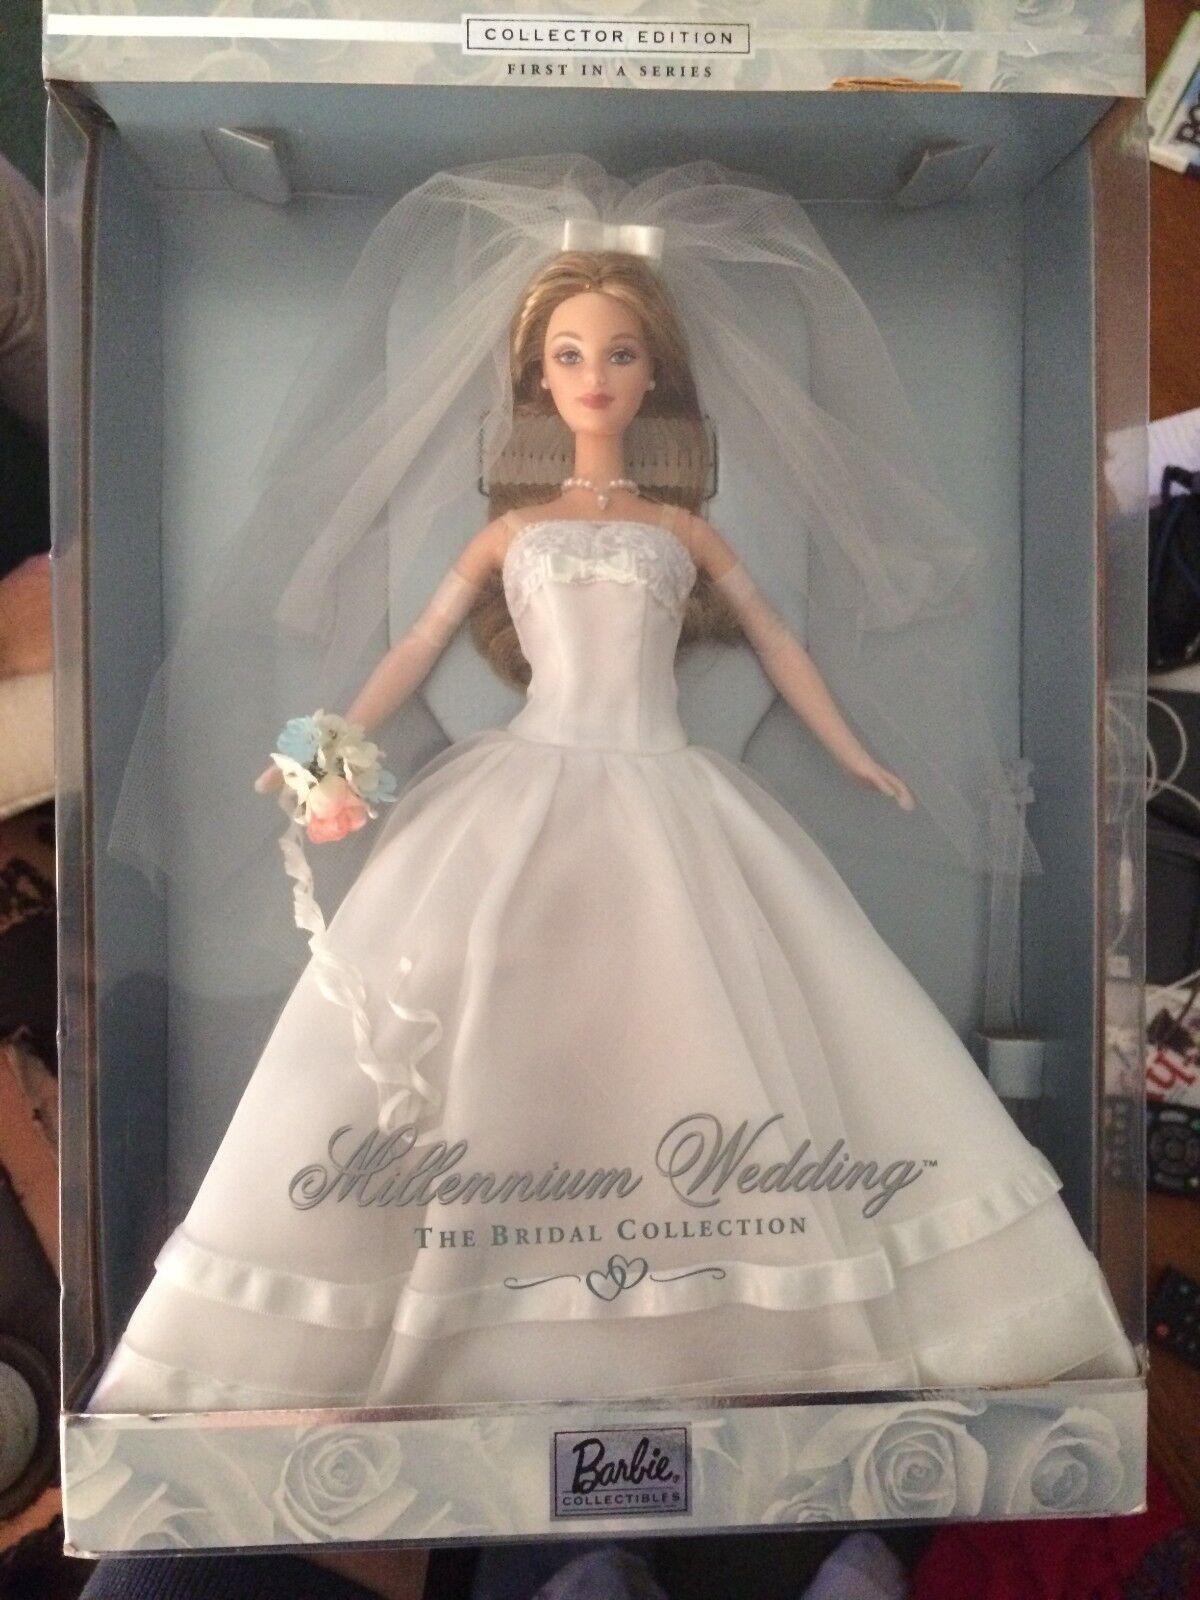 Collector Edition Millennium Wedding Barbie First in a Series Mattel 1999